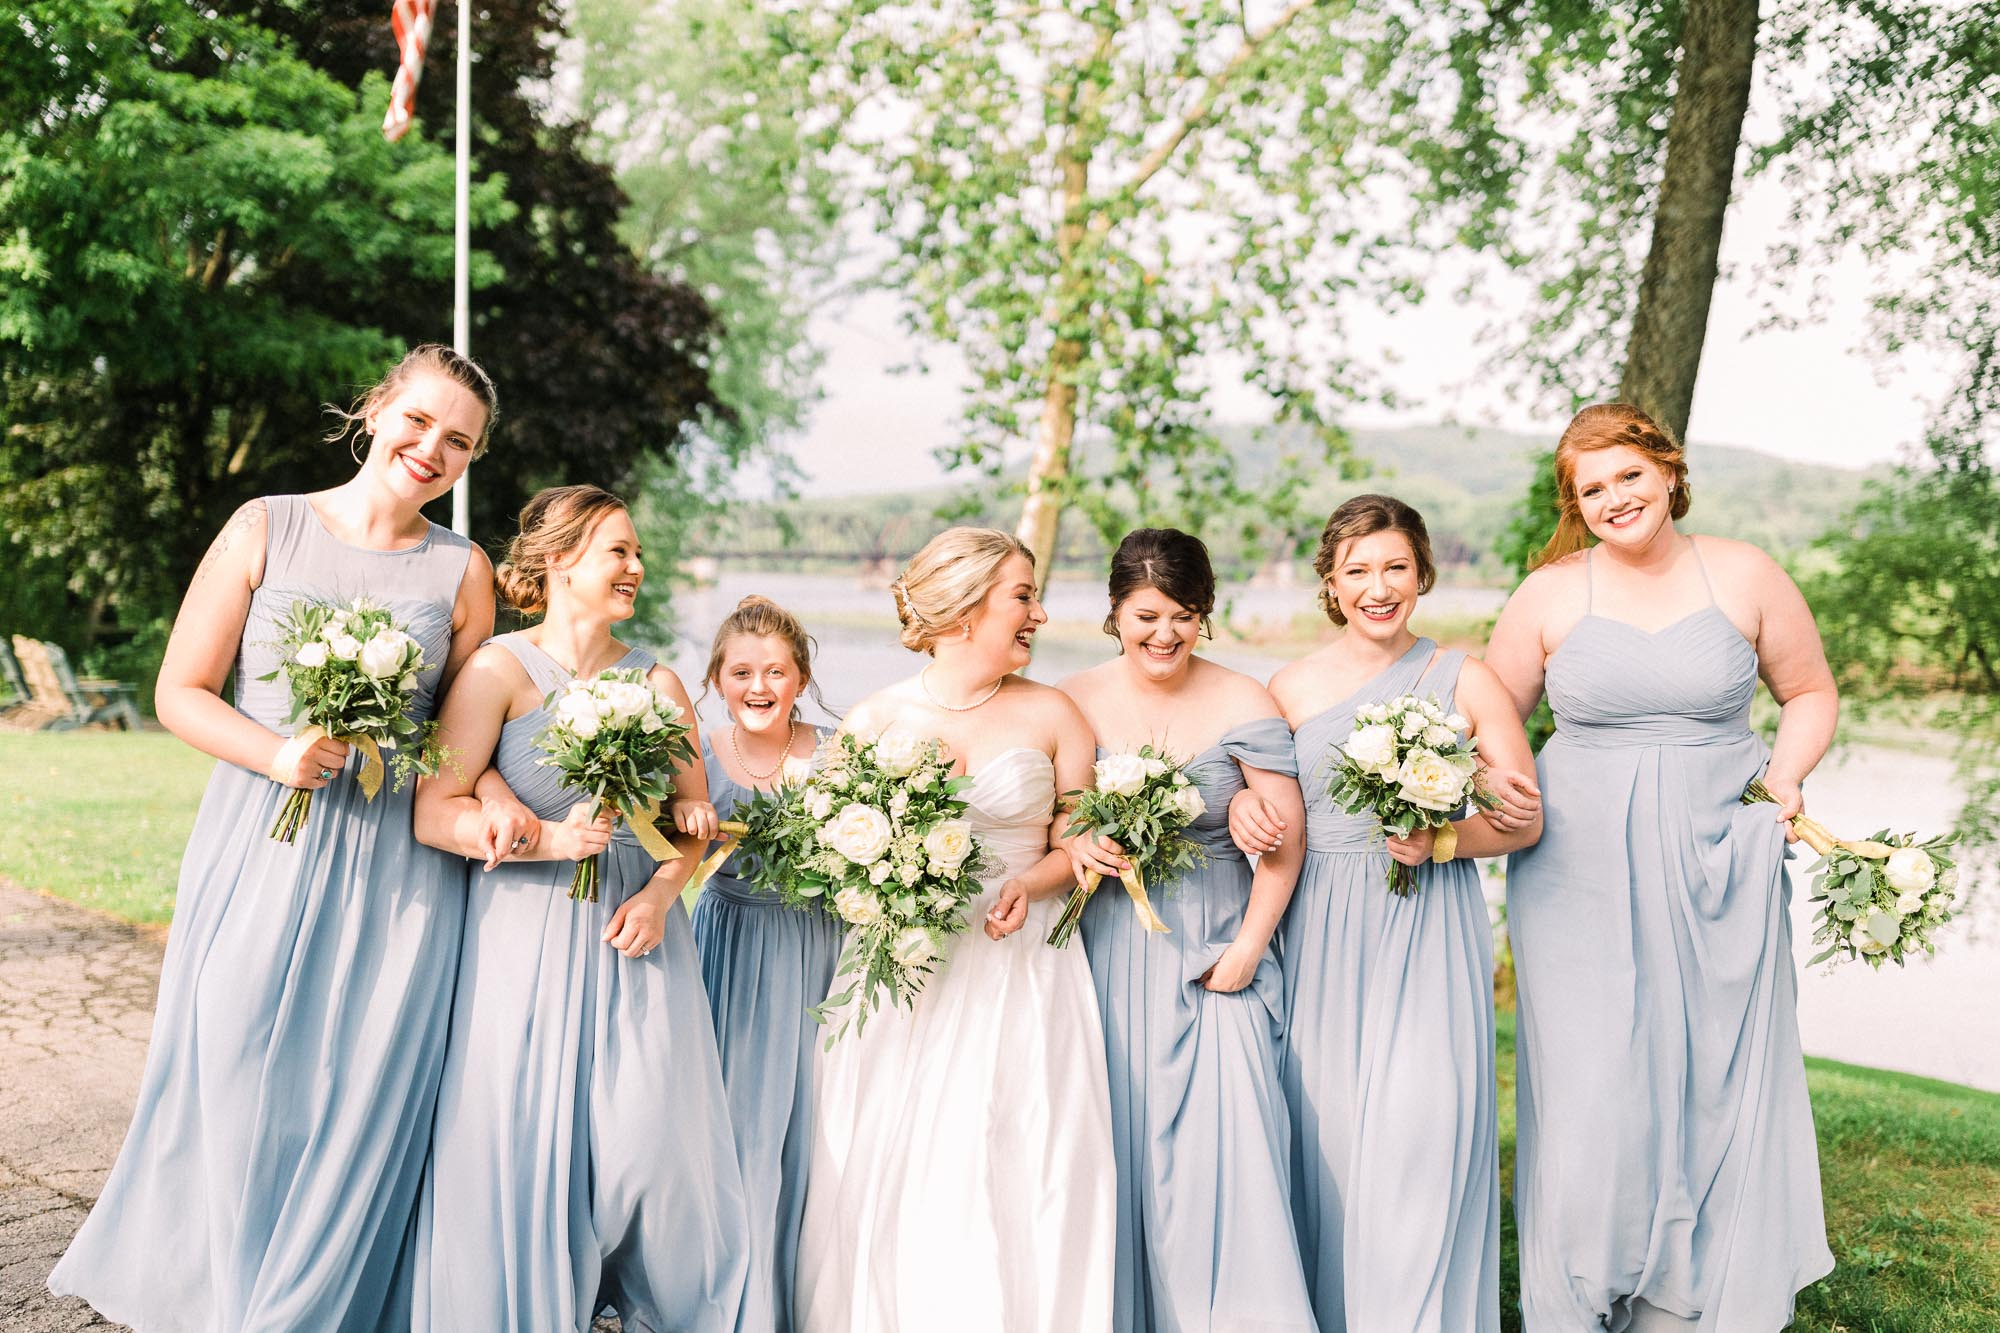 isle-of-que-wedding-6910.jpg